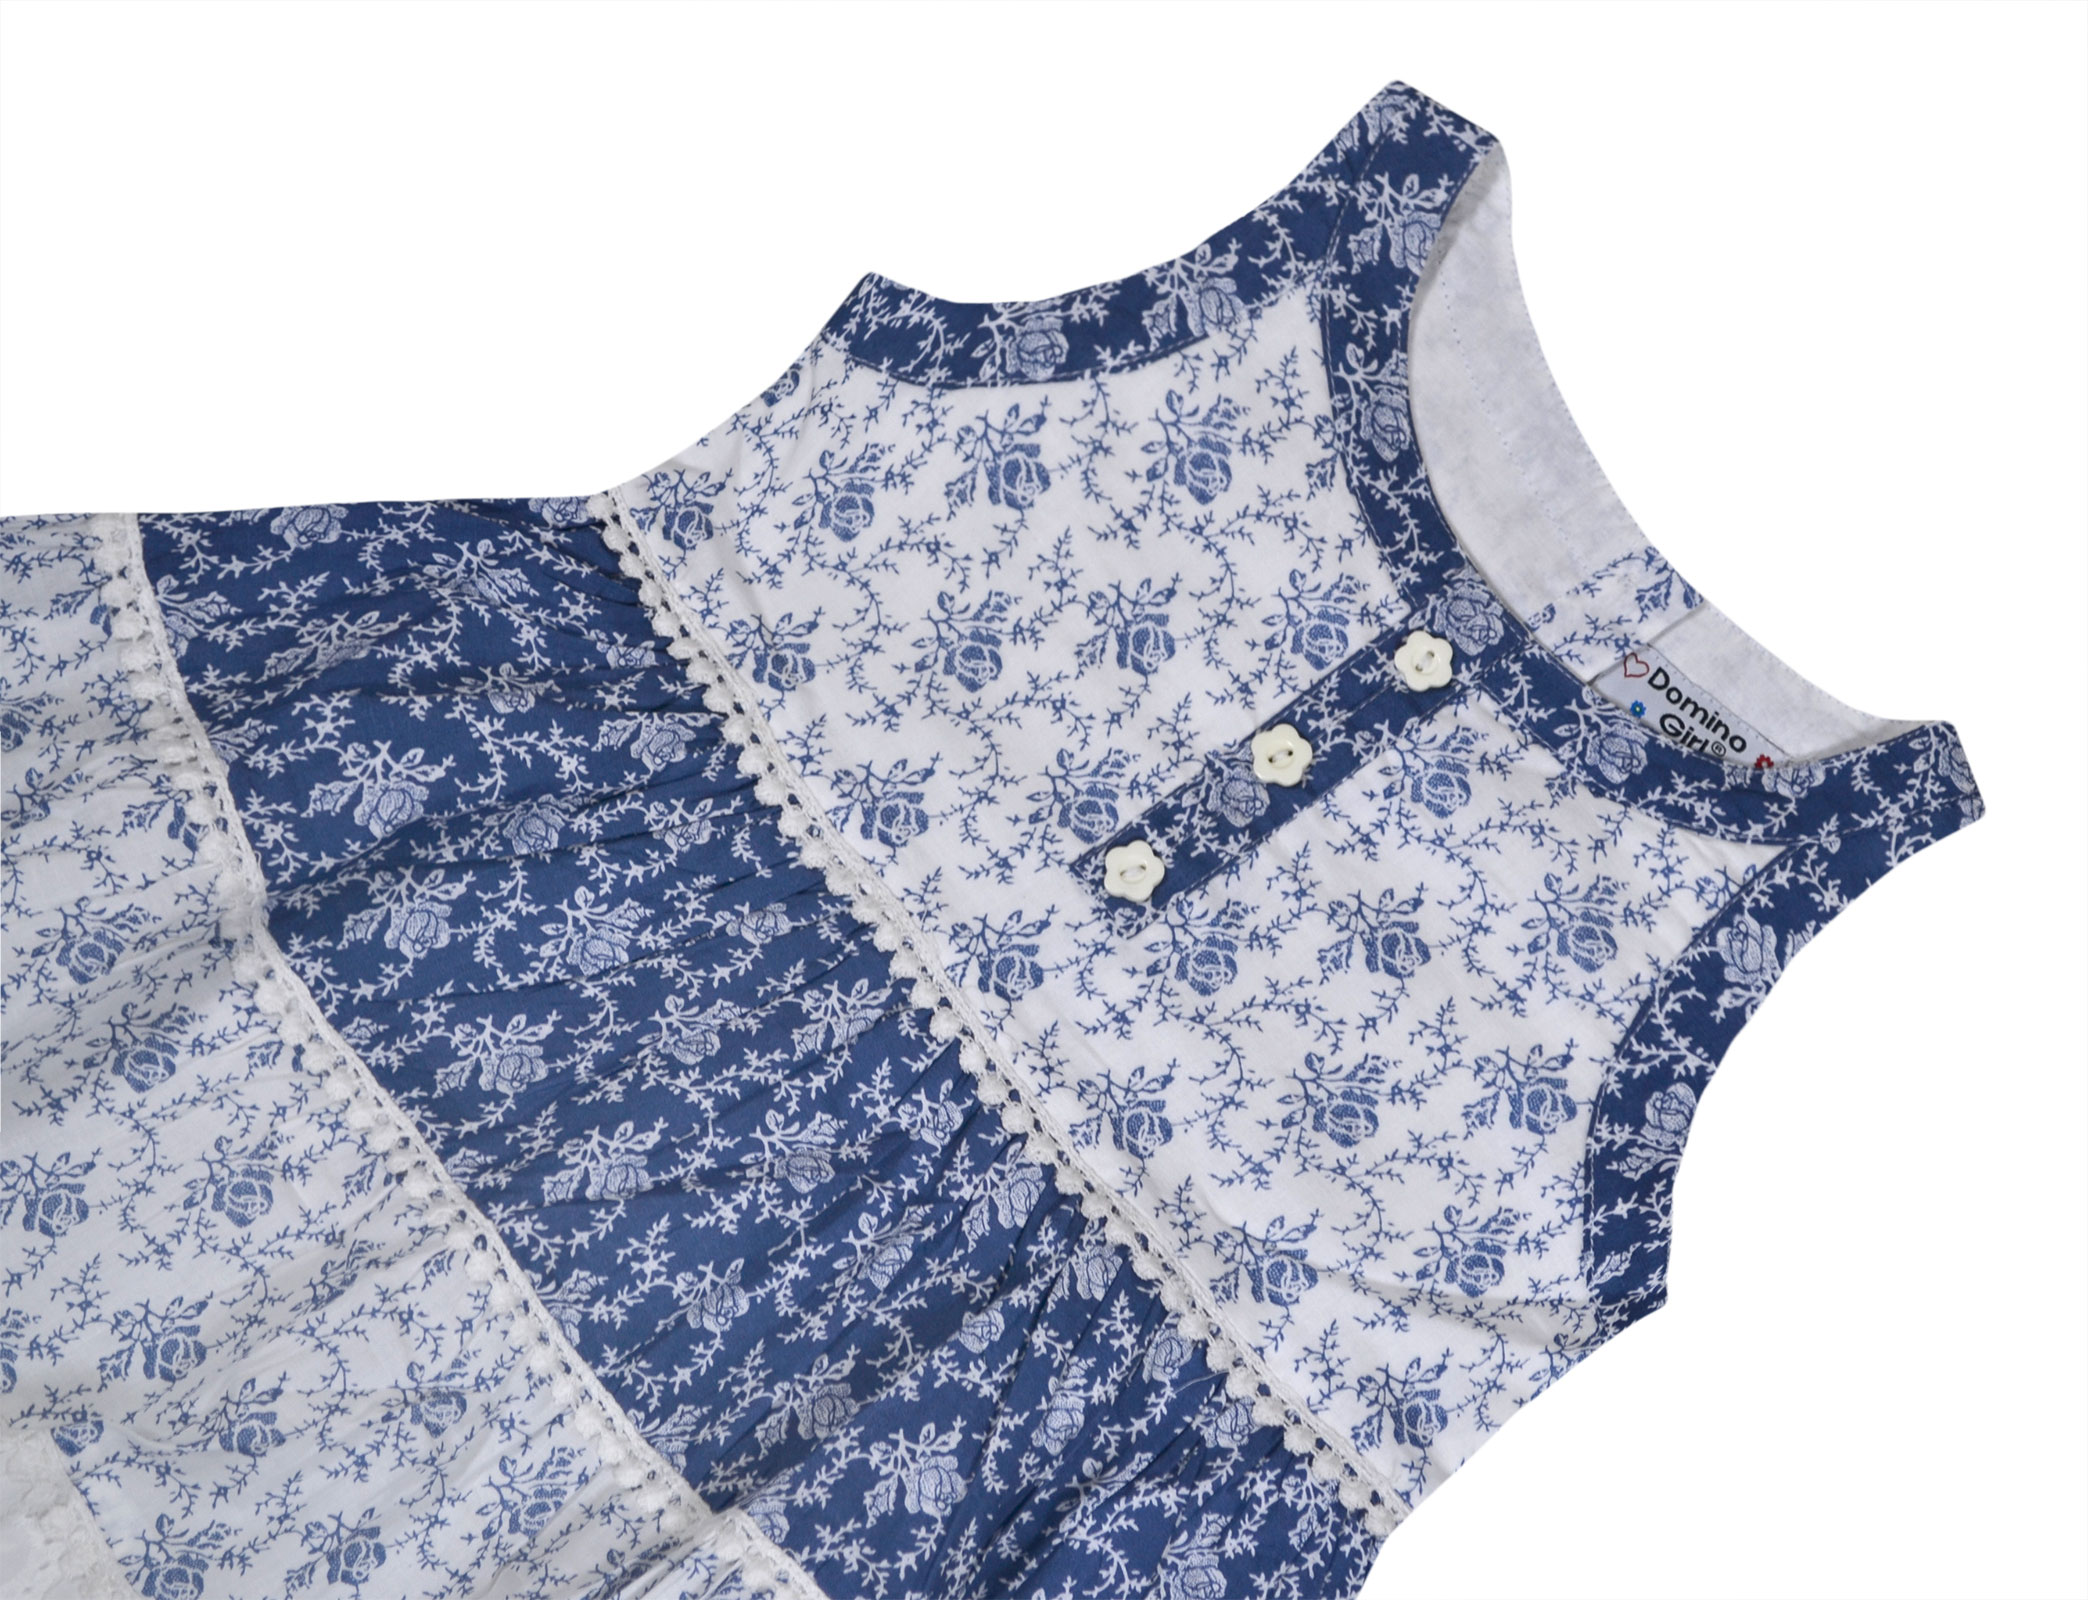 Girls Summer Fashion Thin Dress Sleeveless Floral Skirt Hot Dress Kids N5U3